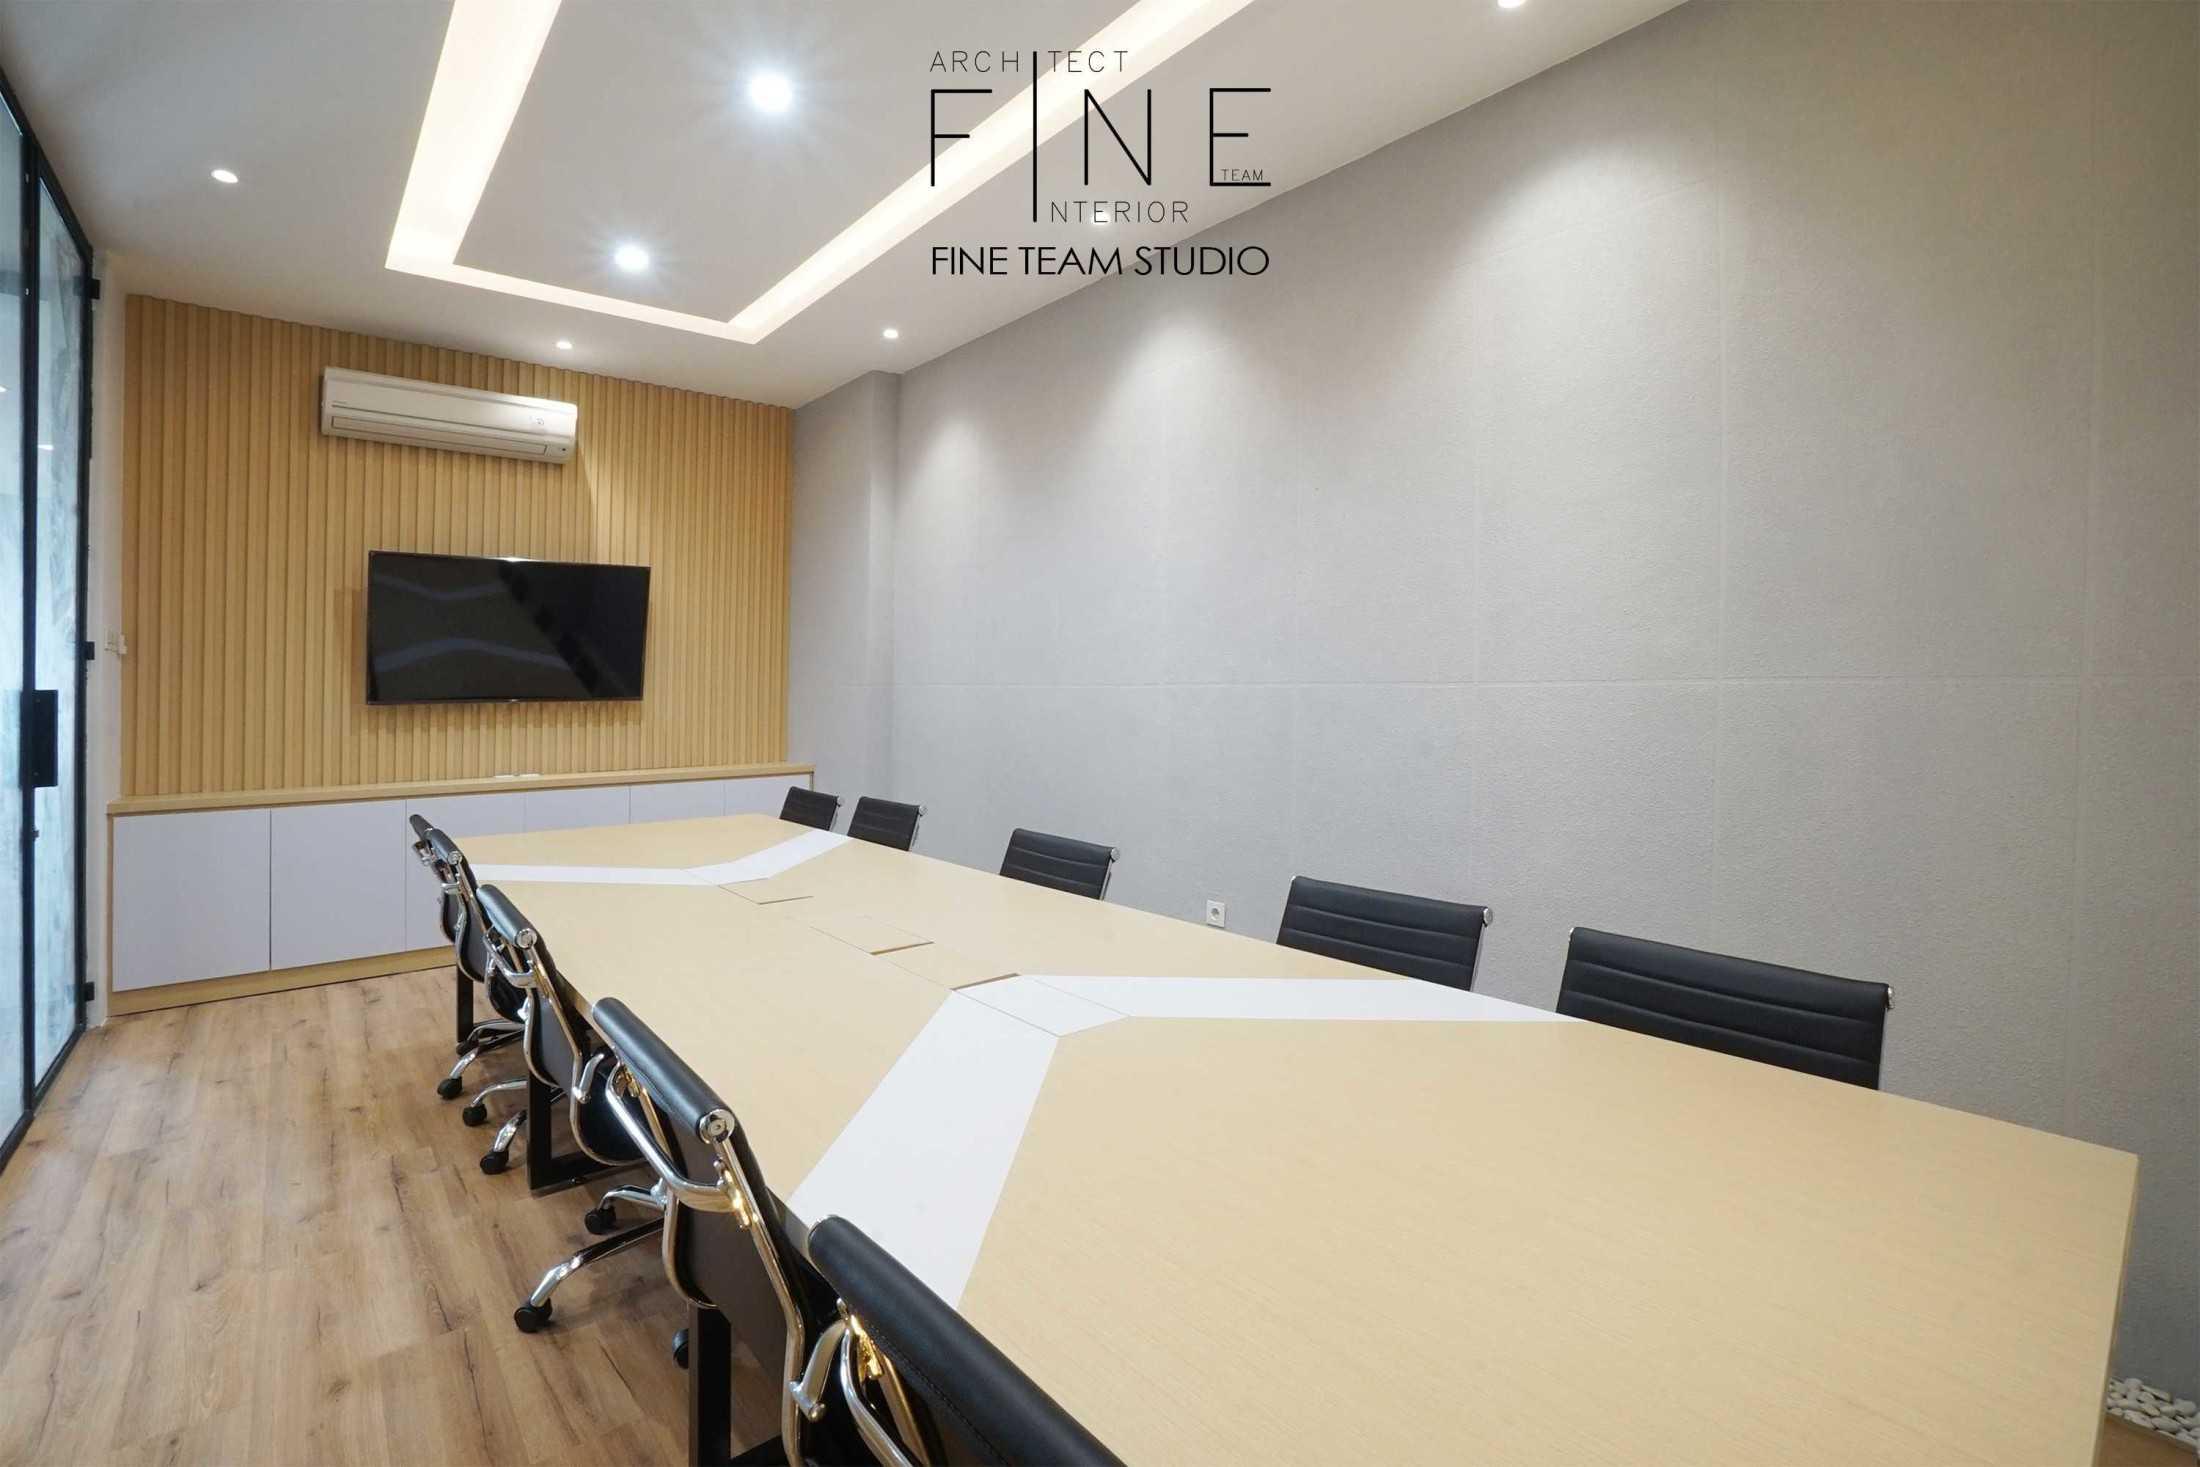 Fine Team Studio Mob Office Cikupa, Tangerang, Banten, Indonesia Cikupa, Tangerang, Banten, Indonesia Fine-Team-Studio-Mob-Office  71152